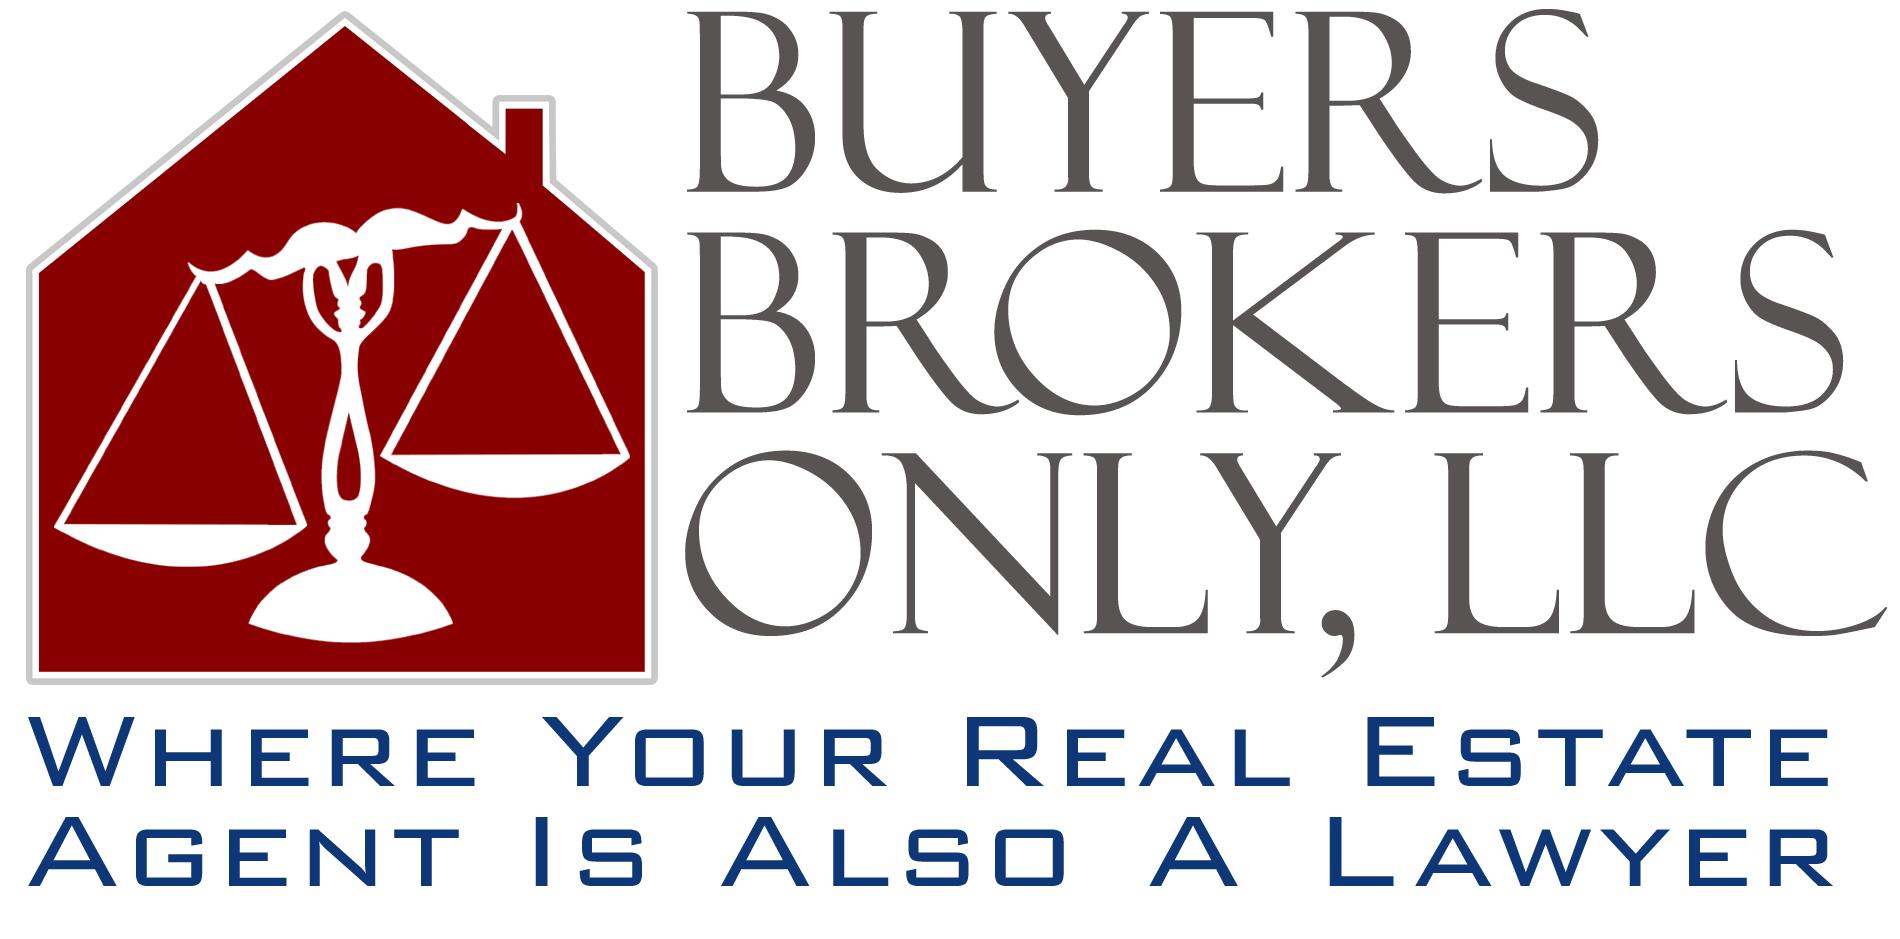 Buyers Brokers Only, LLC - Real Estate Exclusive Buyer Agents